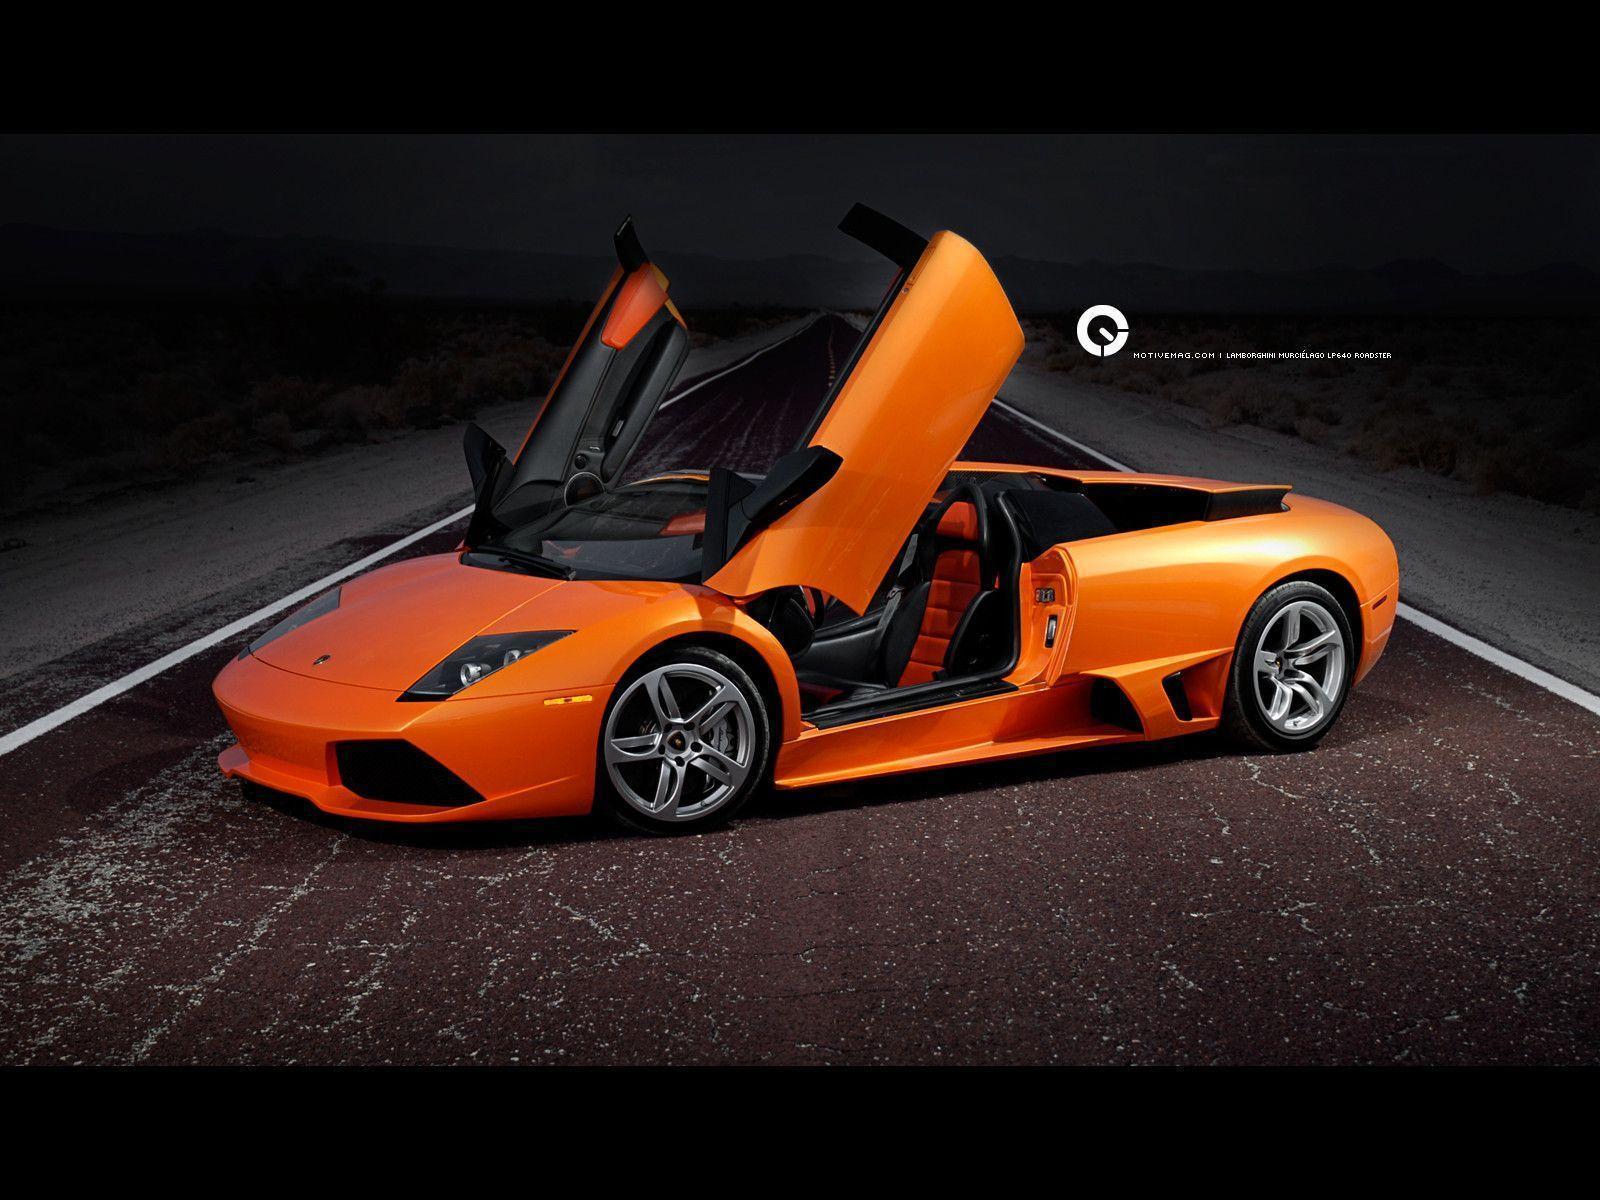 Lamborghini Murciélago images | Lamborghini wallpapers